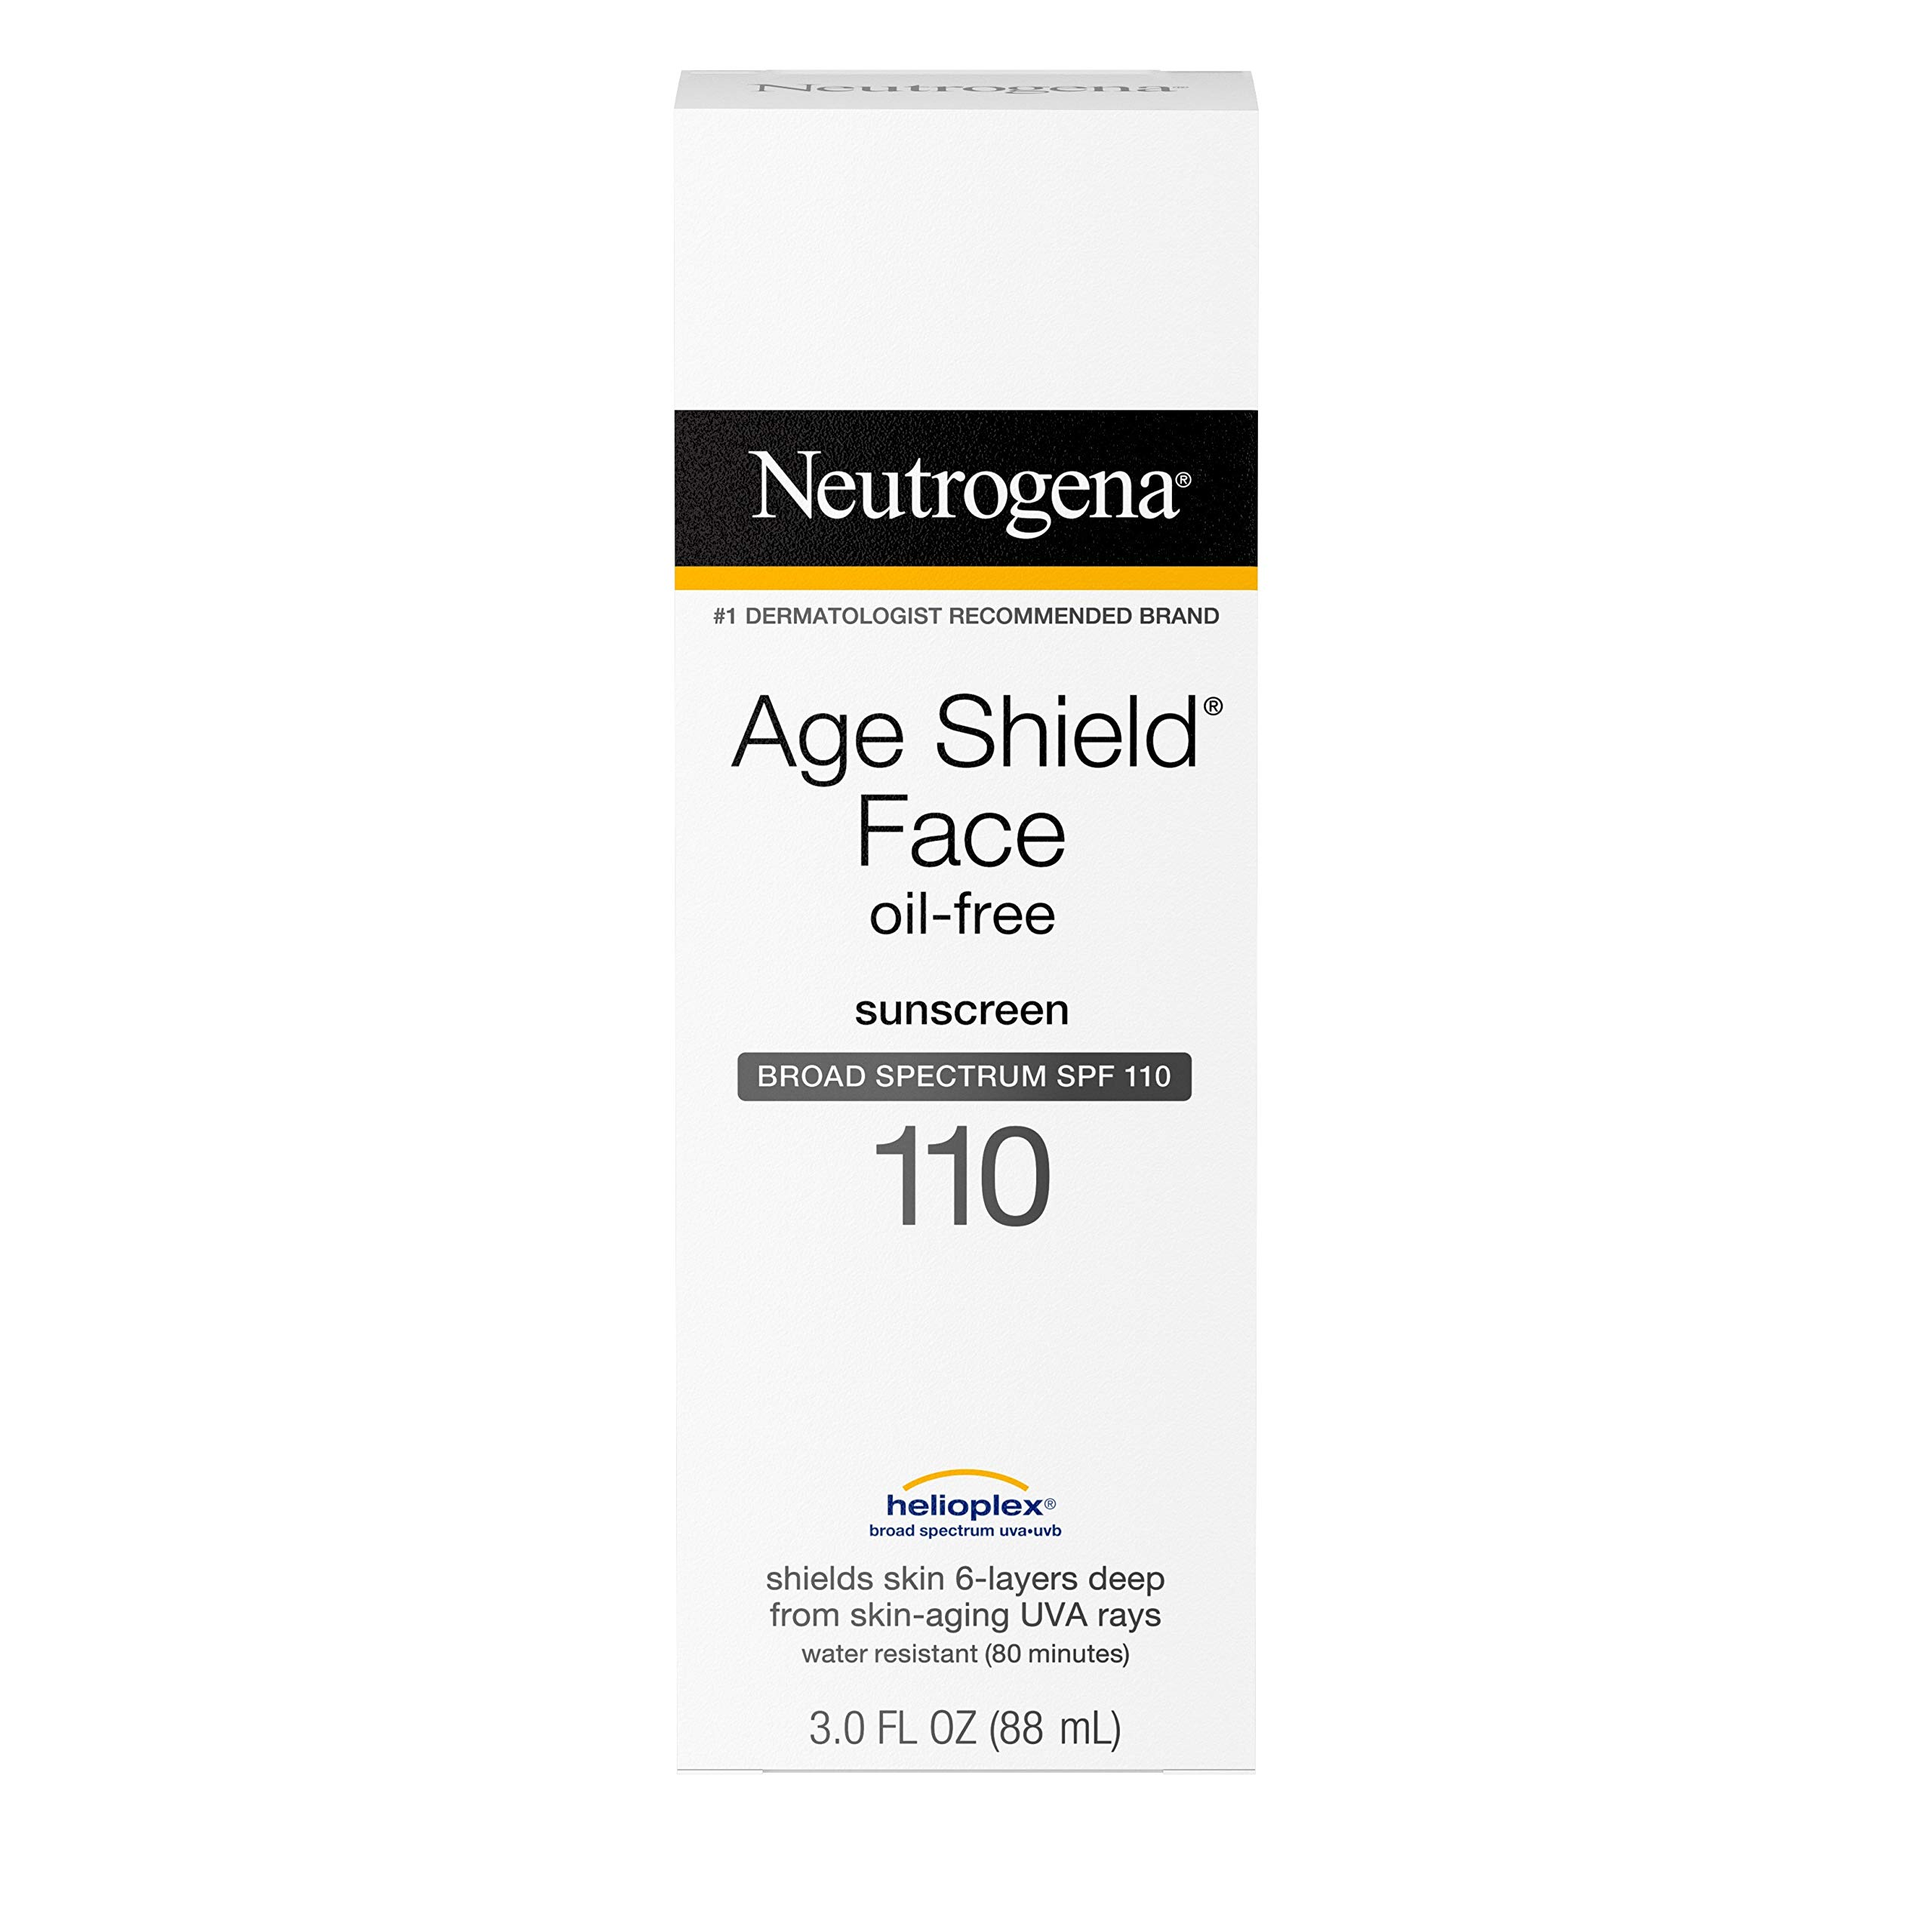 Neutrogena Sunscreen Spectrum Non Comedogenic Moisturizing